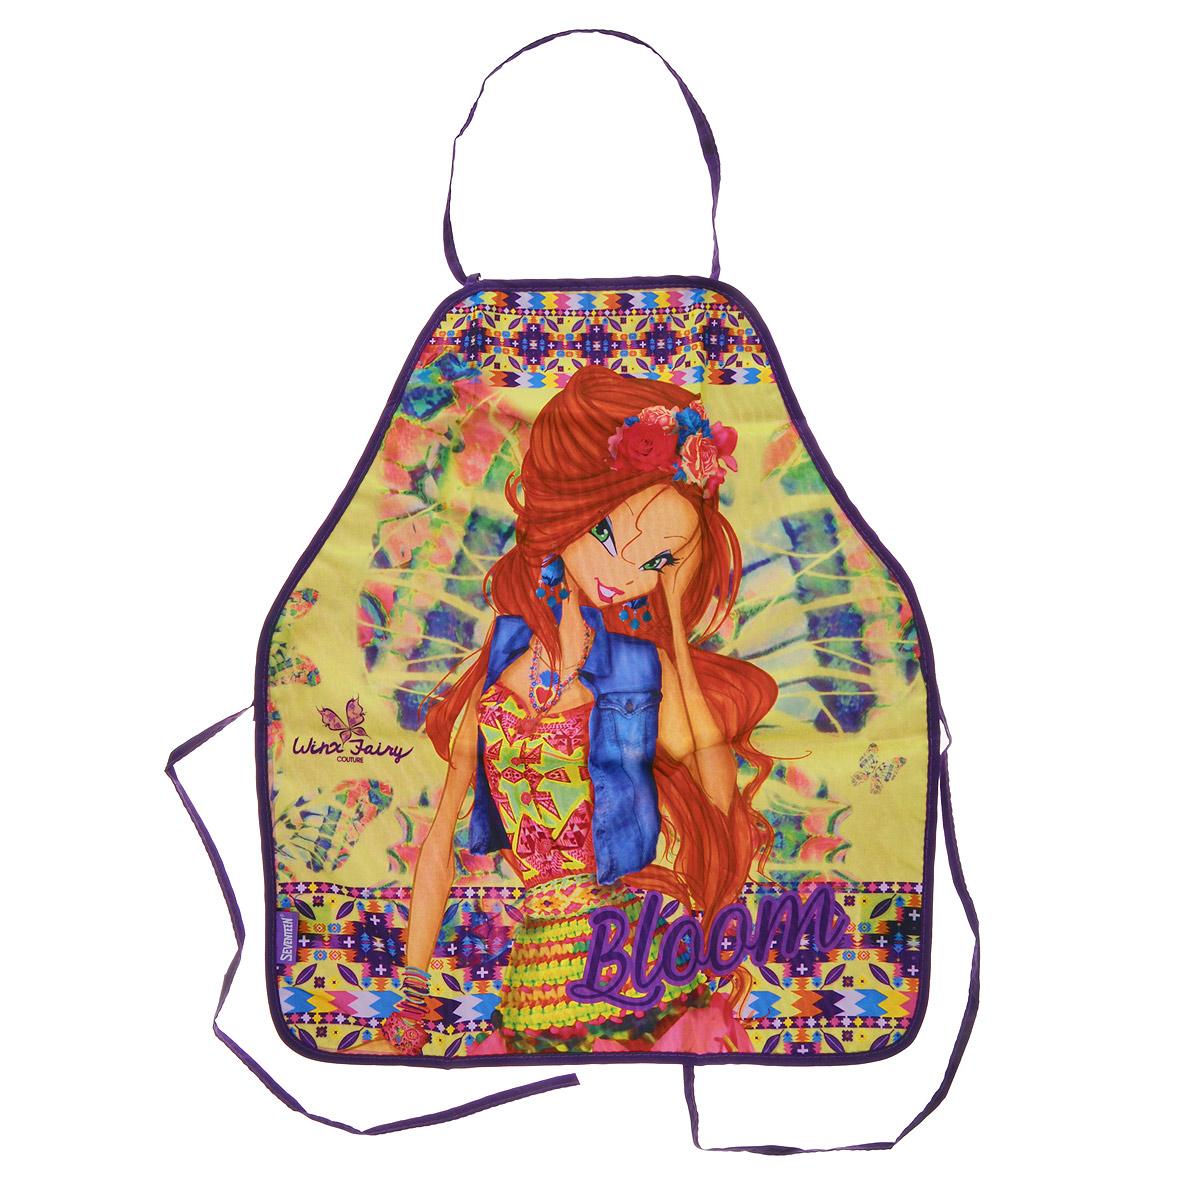 Фартук Winx Club Seventeen: Winx Fairy Couture, цвет: фиолетовый ты модный дизайнер winx fairy counture